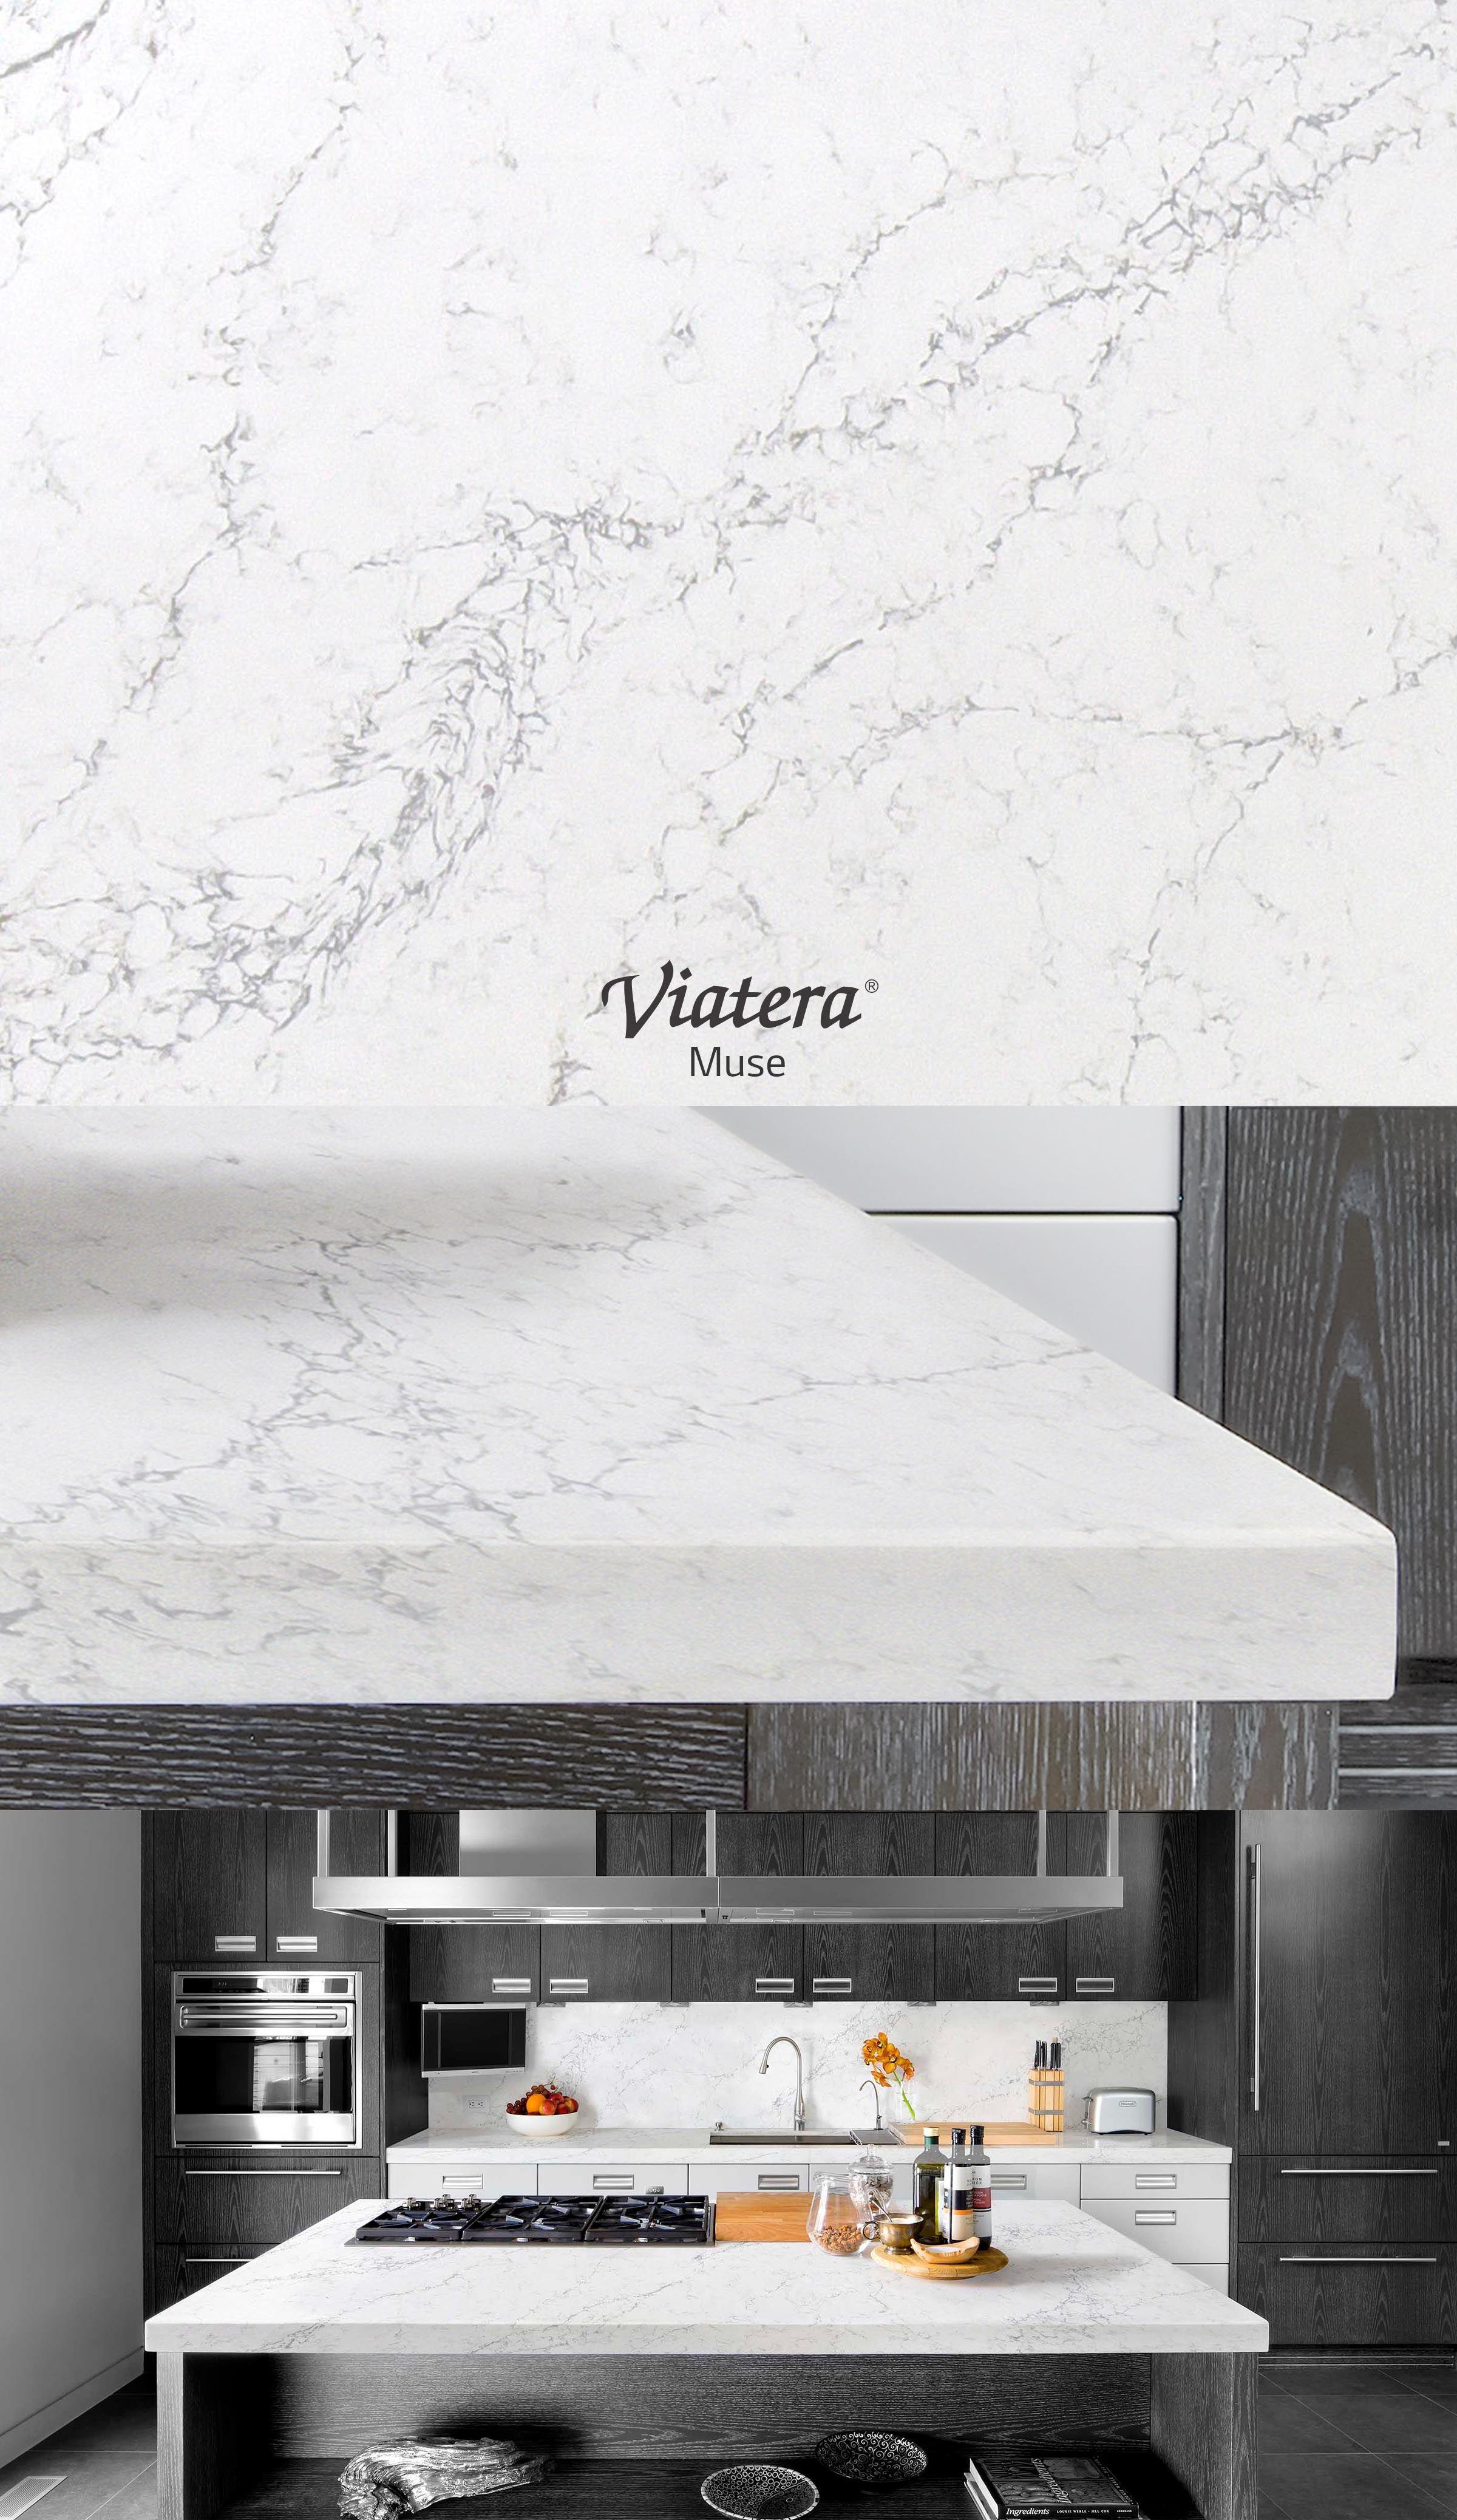 717 W Annie Bar countertop will be Viatera Muse l Quartz waterfall ...